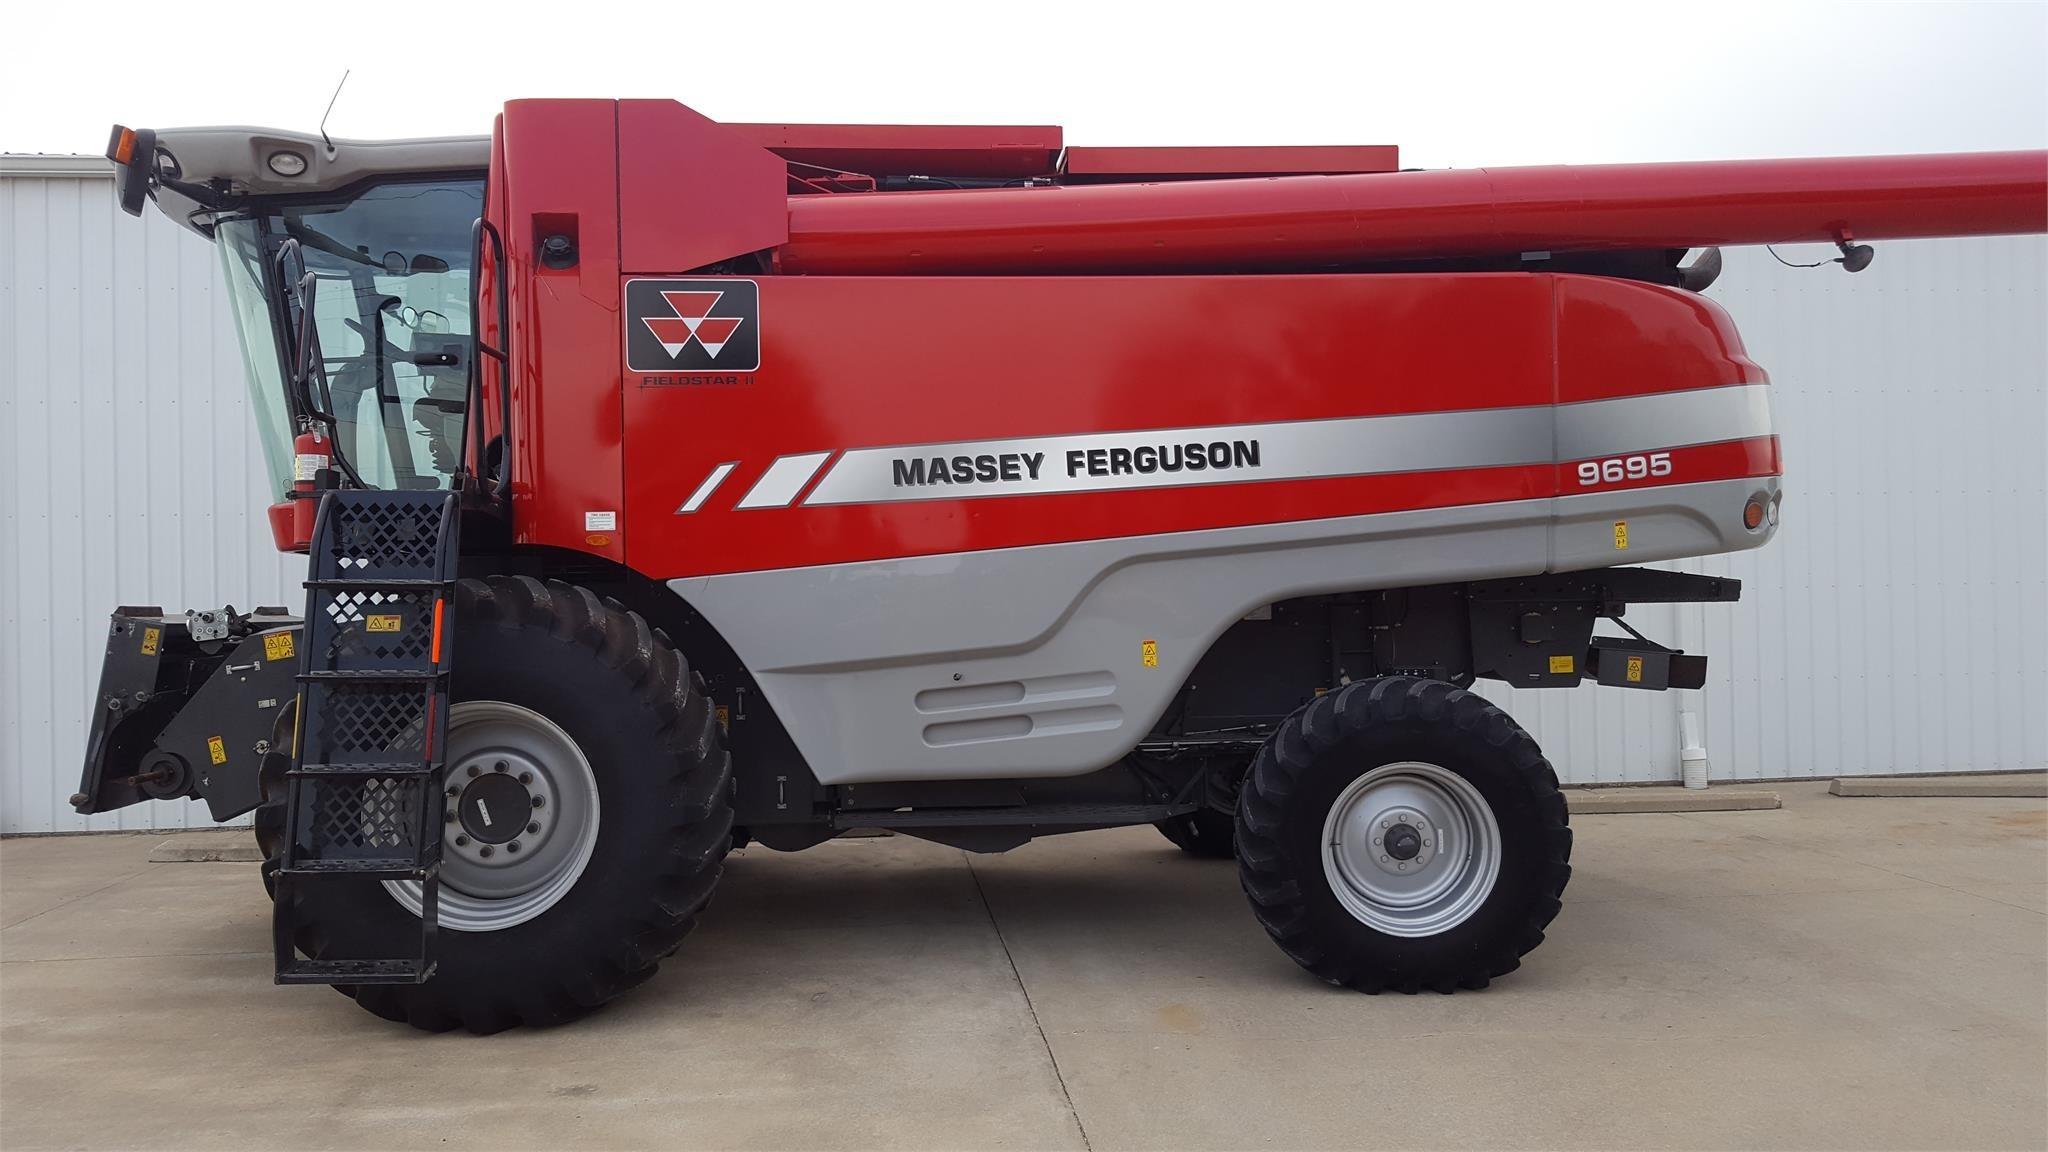 2011 Massey Ferguson 9695 Combine